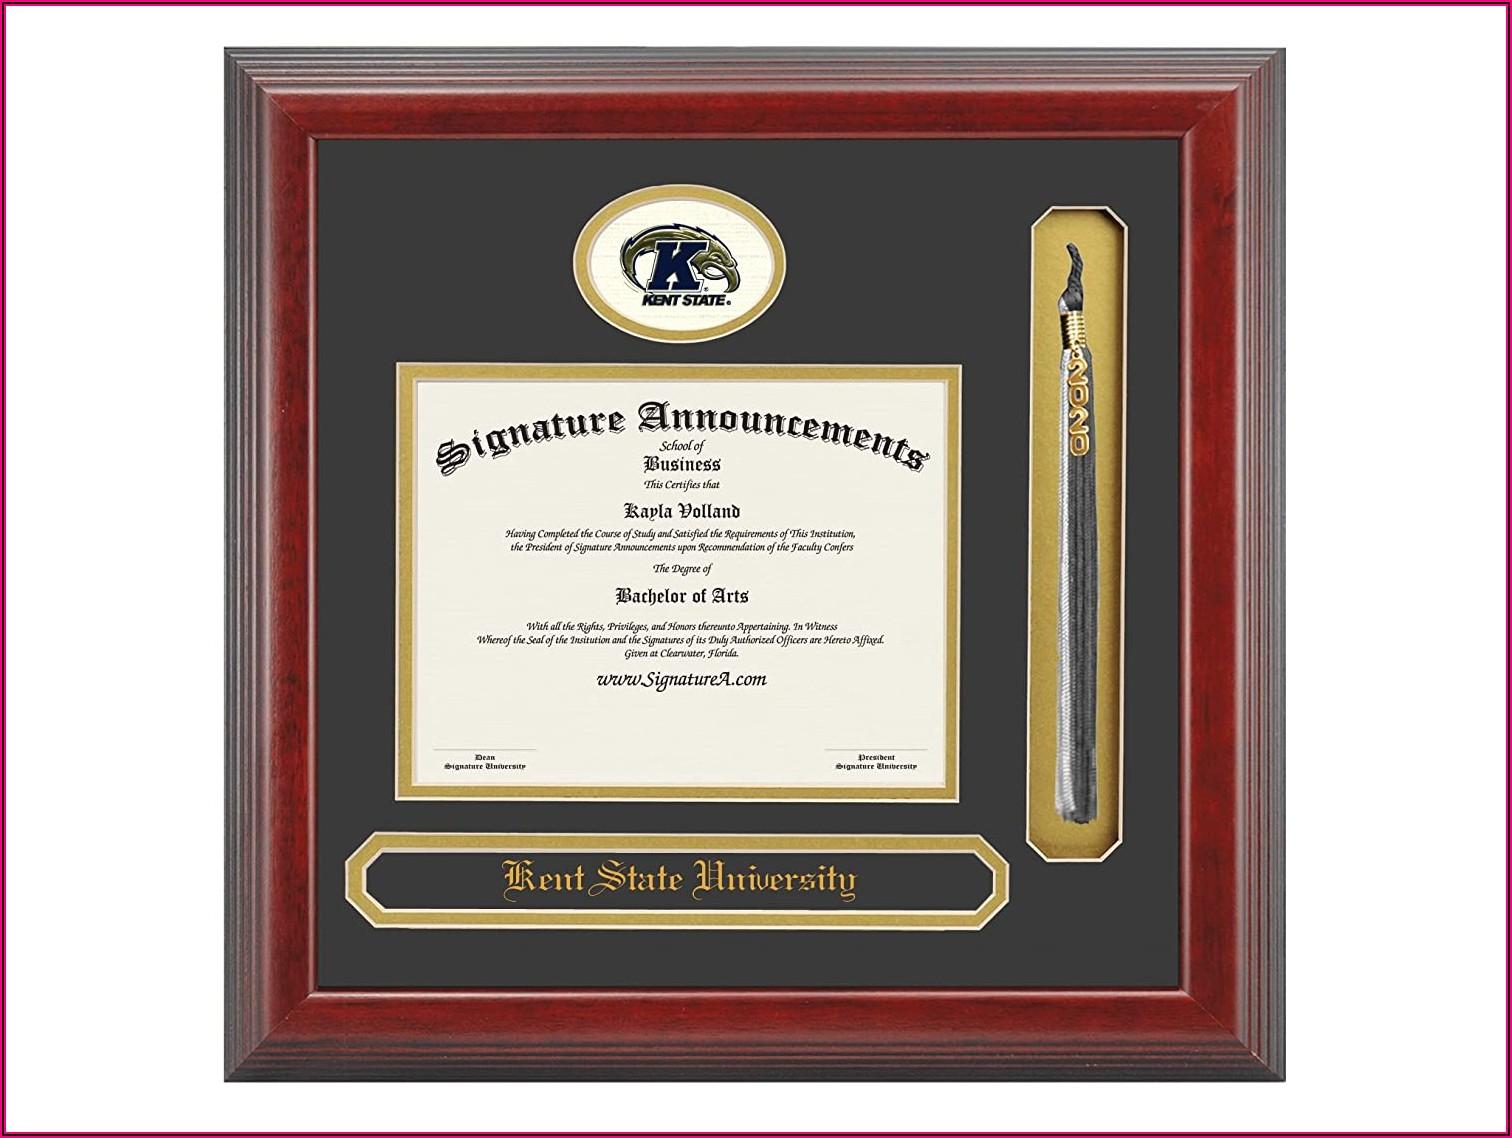 Kansas State University Graduation Announcements